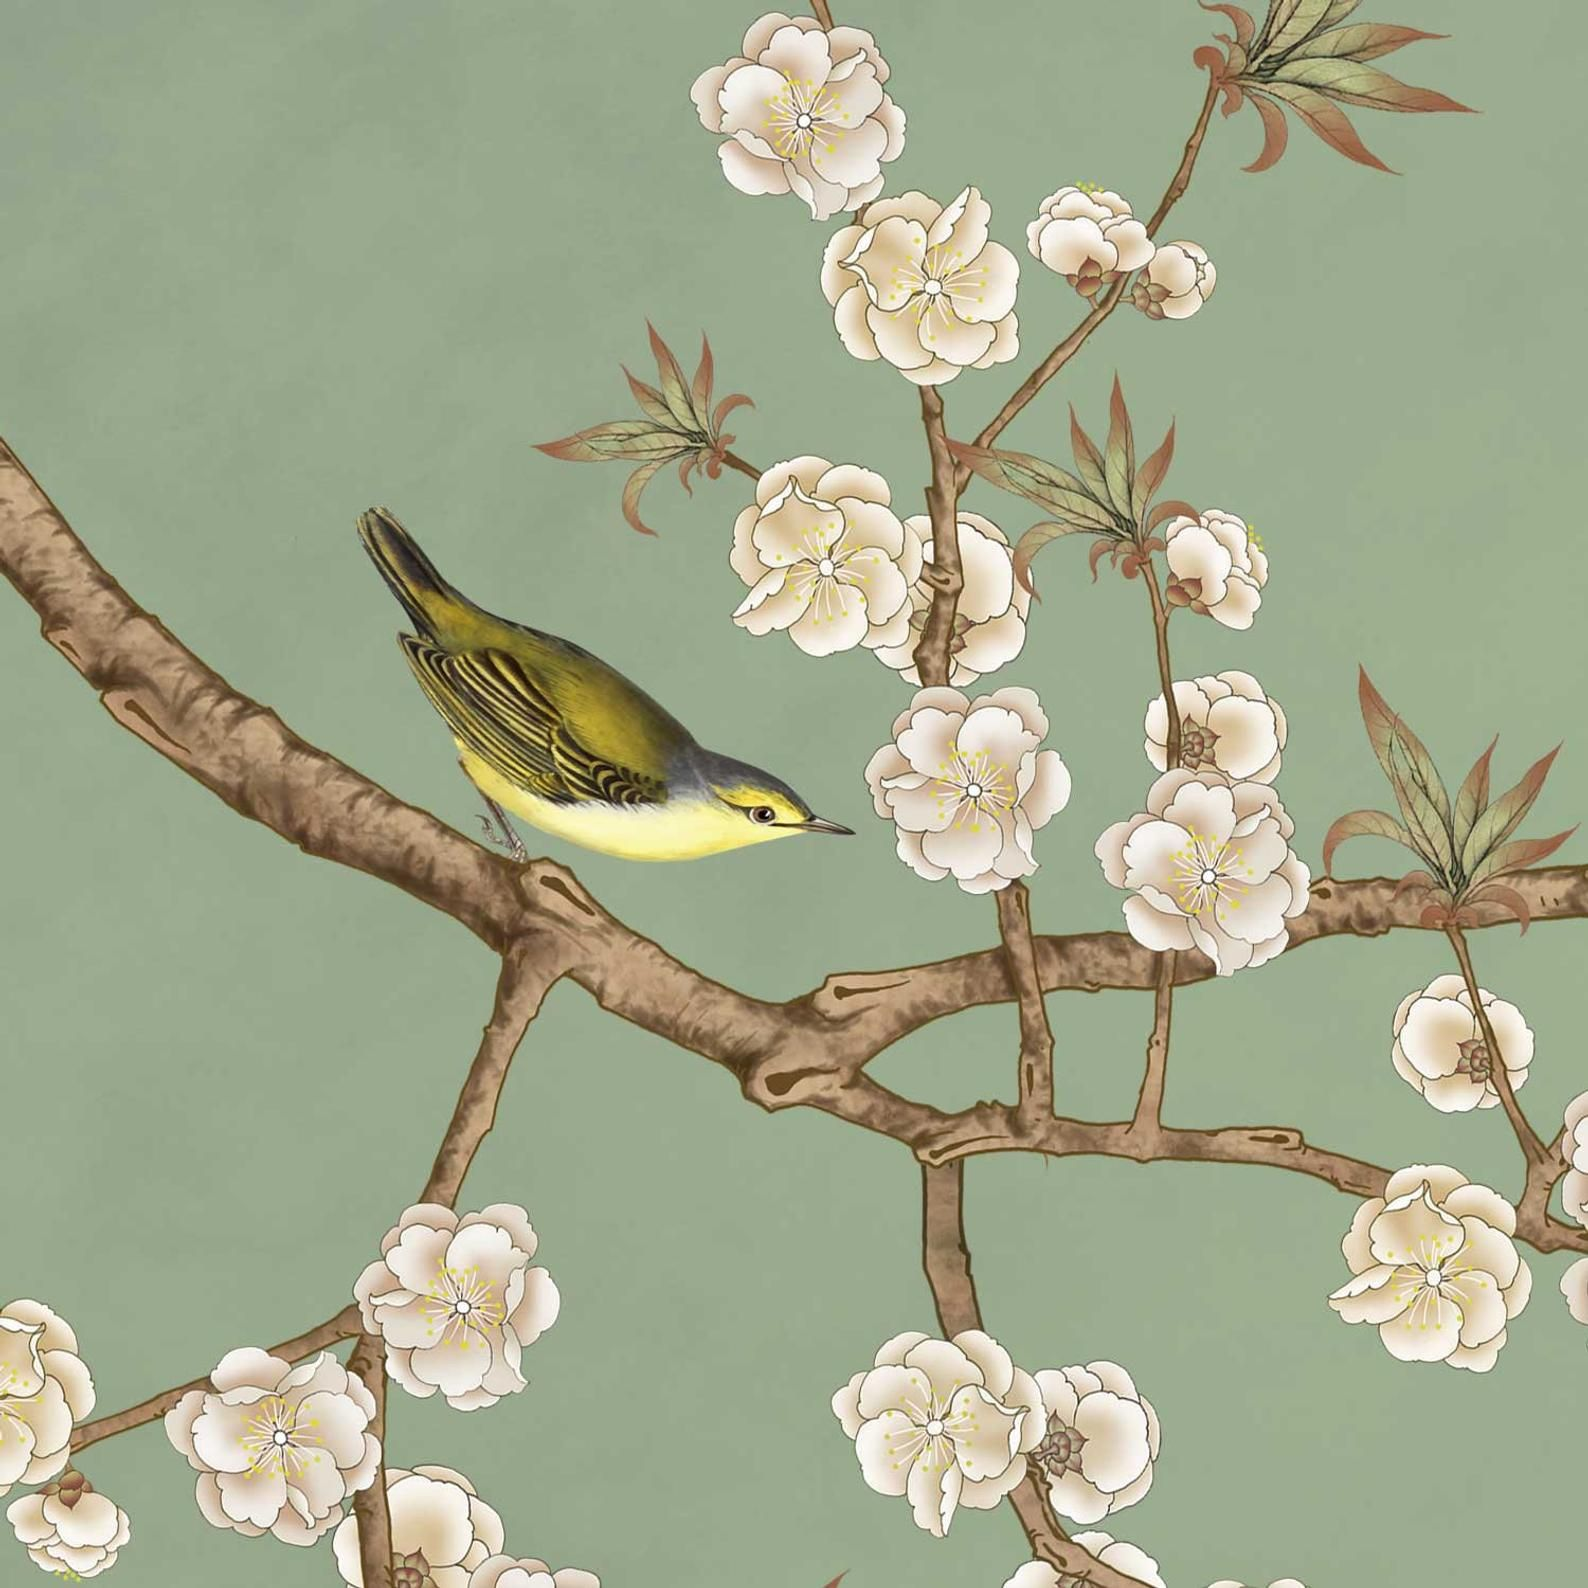 Nauzha Chinoiserie Wallpaper Vintage Bird Wallpaper Etsy Chinoiserie Wallpaper Vintage Bird Wallpaper Bird Wallpaper